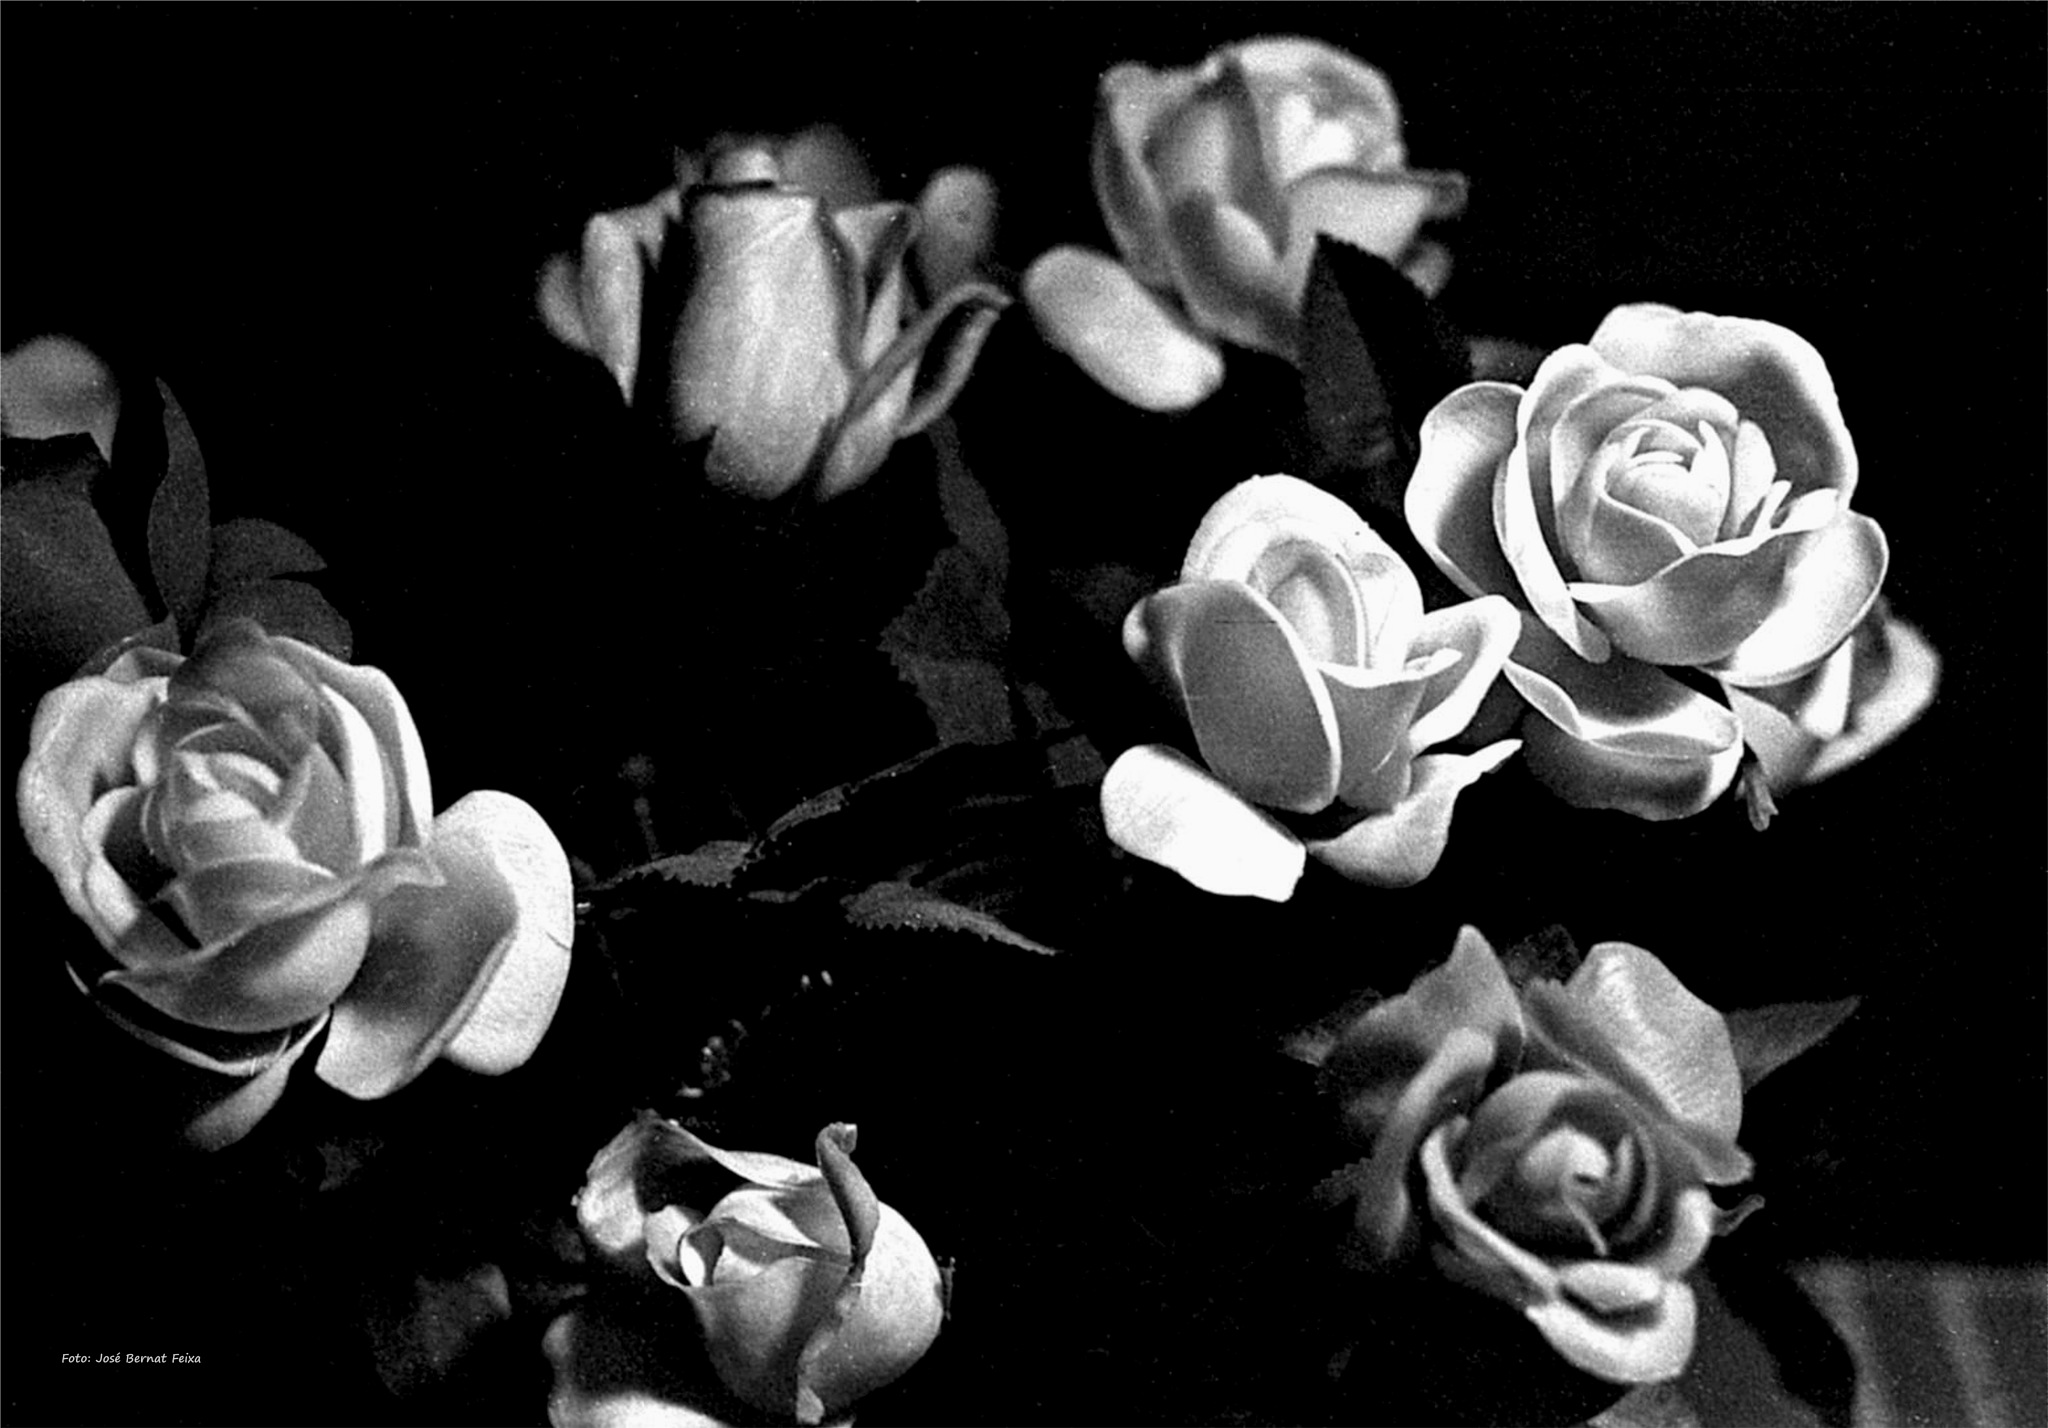 ROSAS; ROZEN; ROSES (60's) by José Bernat Feixa